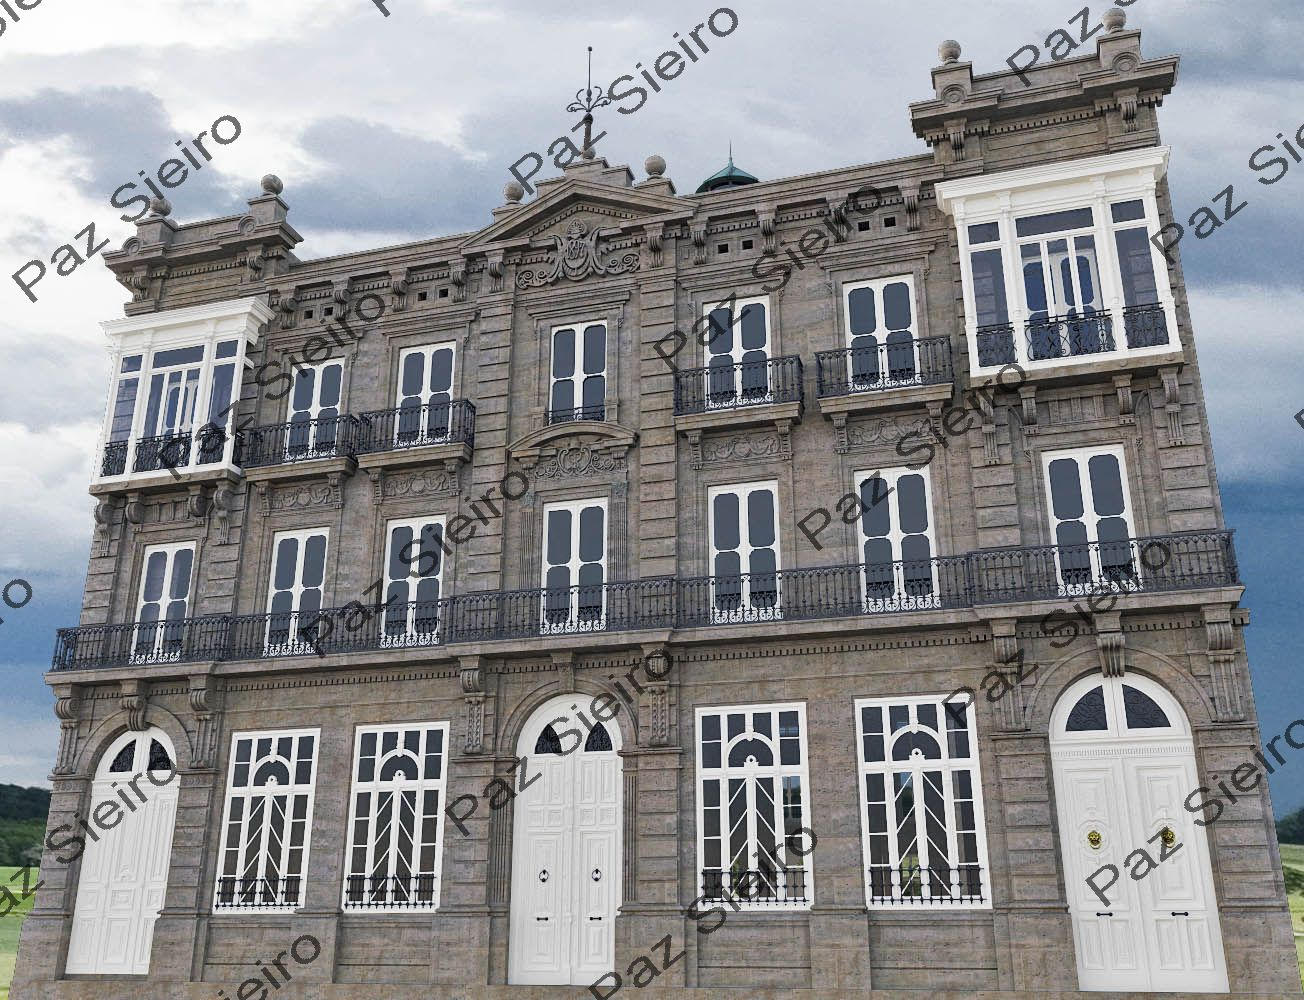 Works 3d edificio sime n 1894 r a progreso ourense arquitecto serra y pujol - Arquitectos ourense ...